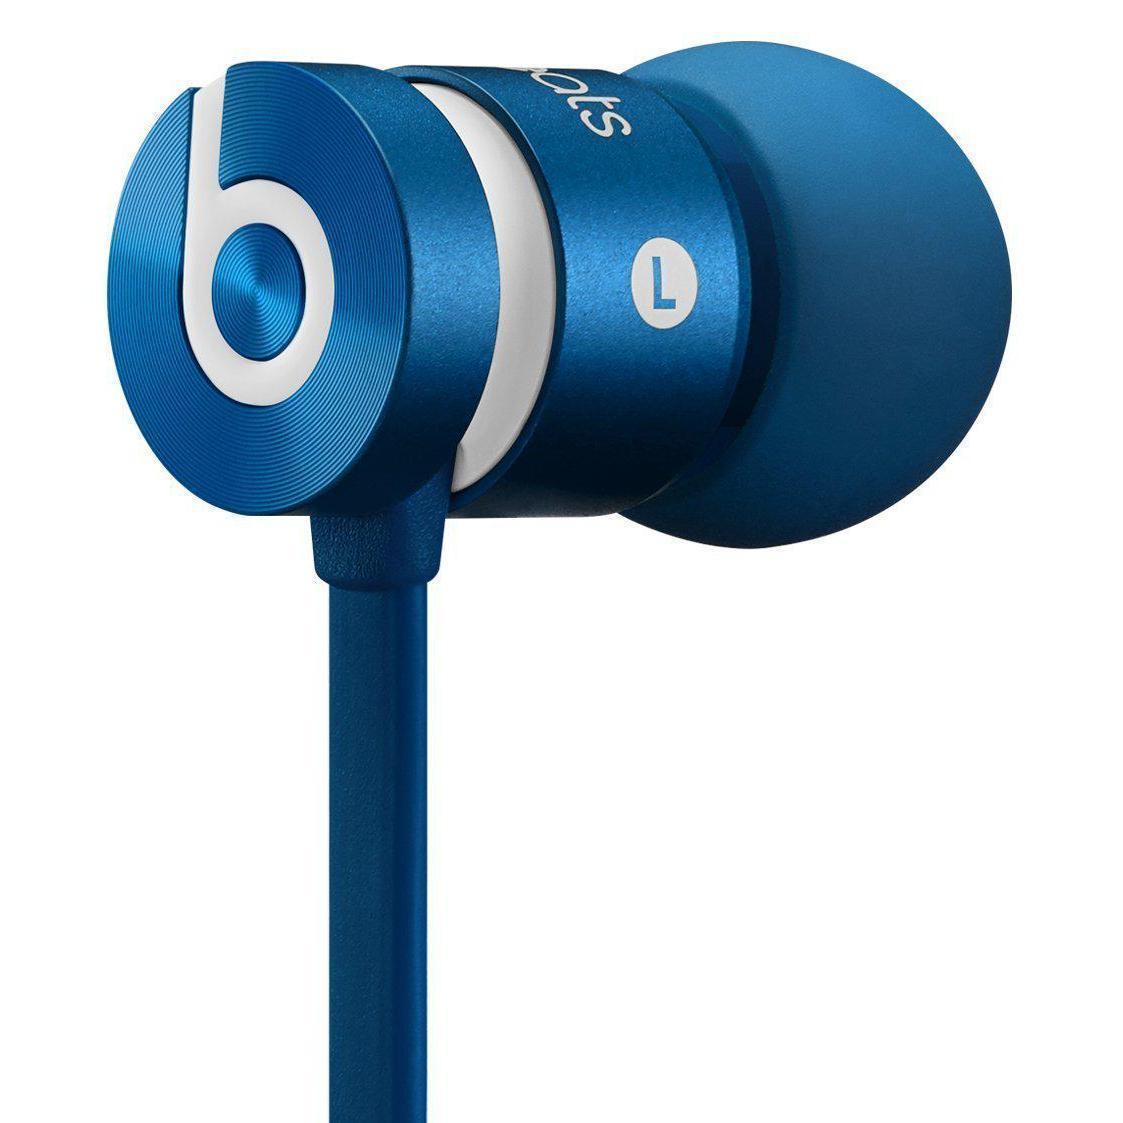 Ecouteurs Beats Urbeats - Bleu